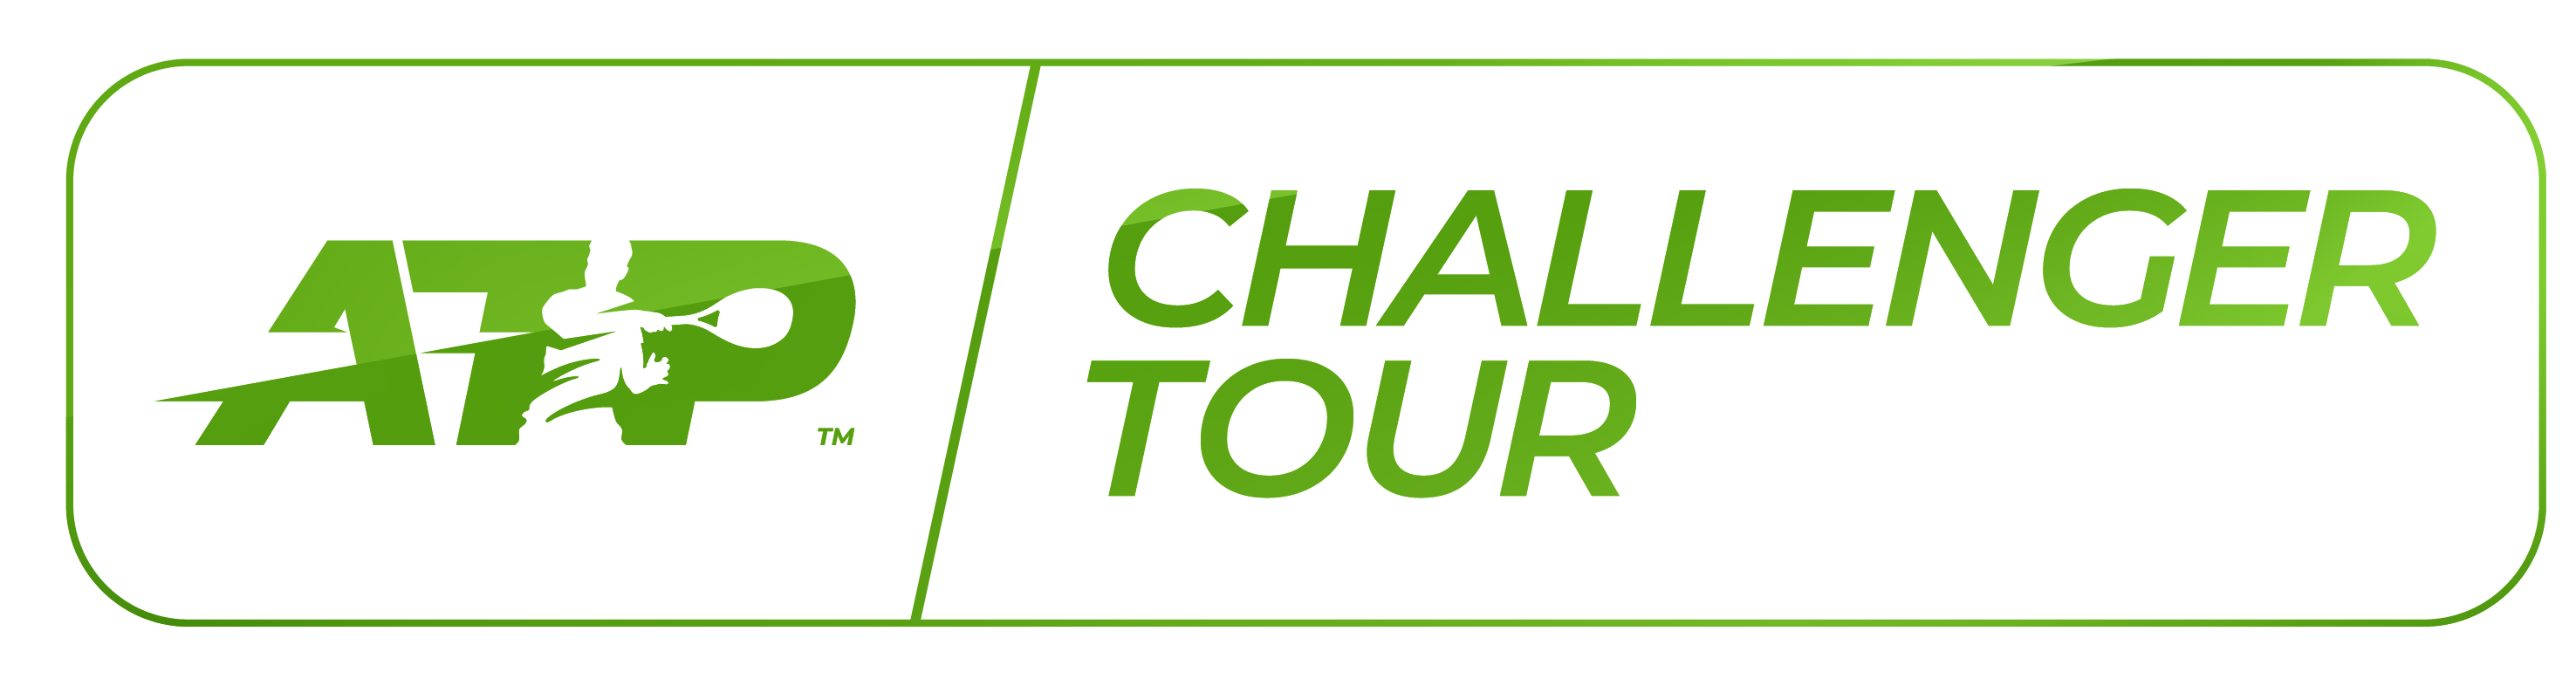 ATP Challenger Tour logo invert